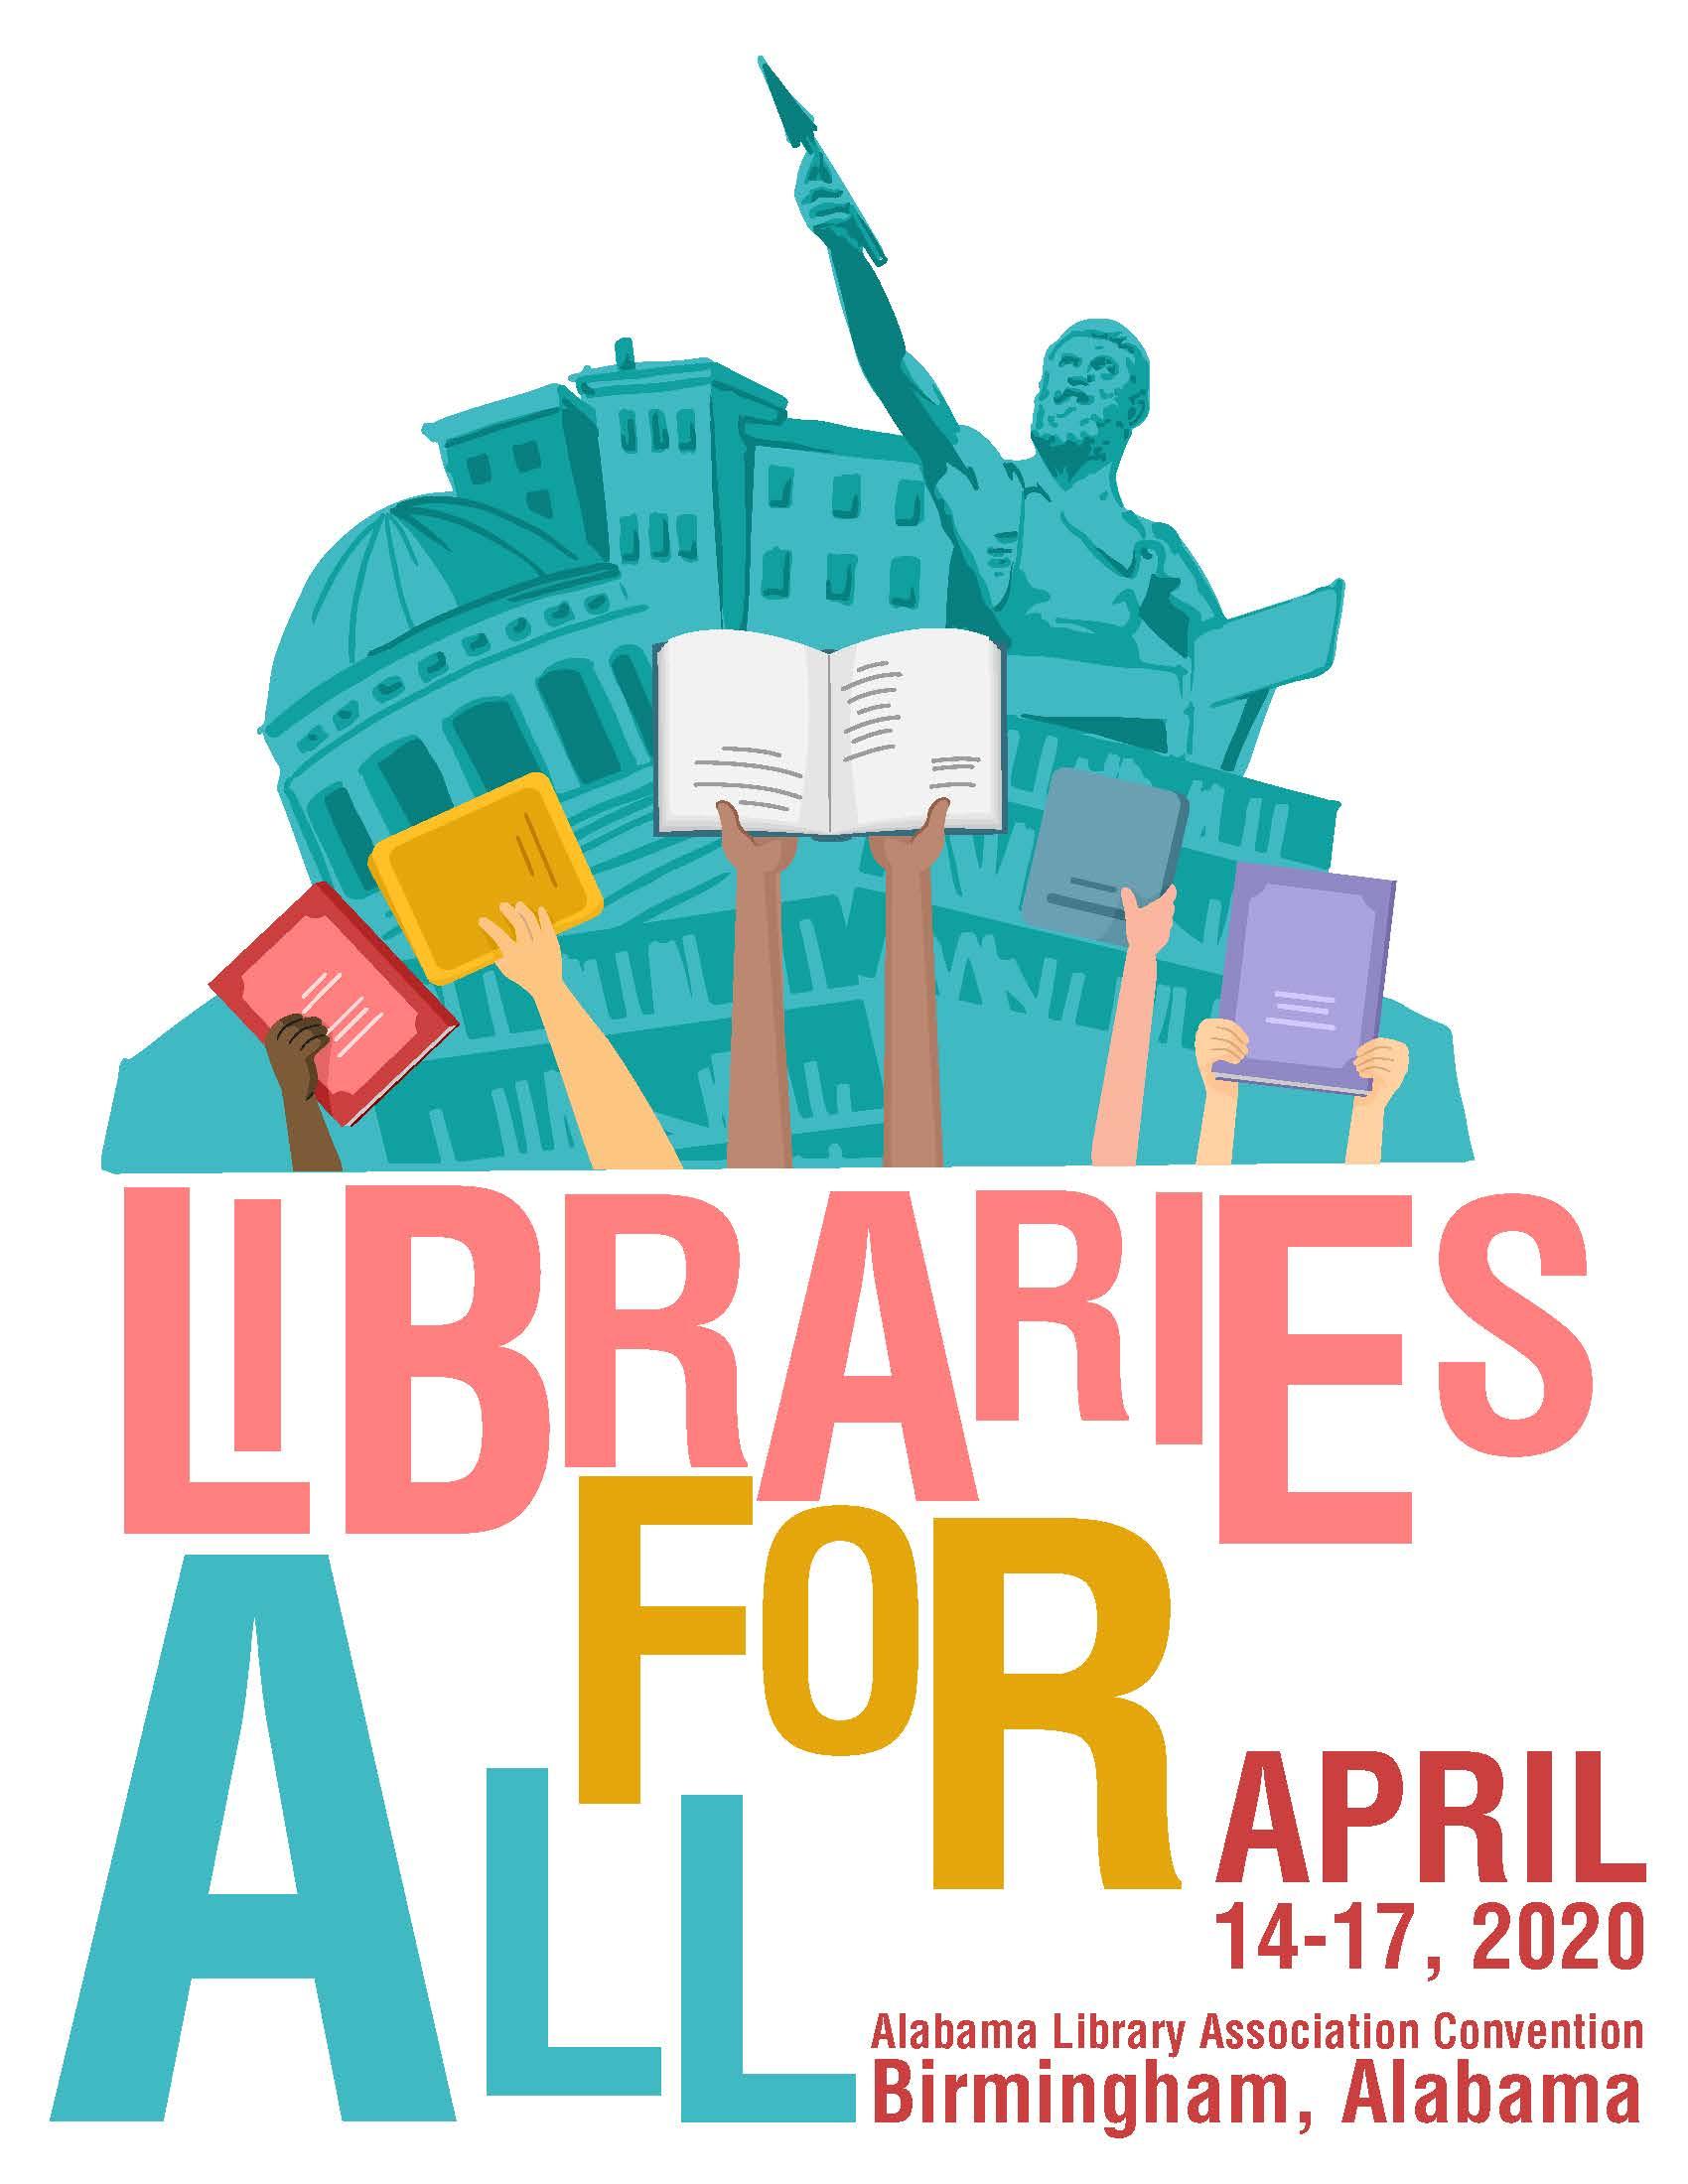 2020 ALLA Annual Convention Logo: Libraries For All